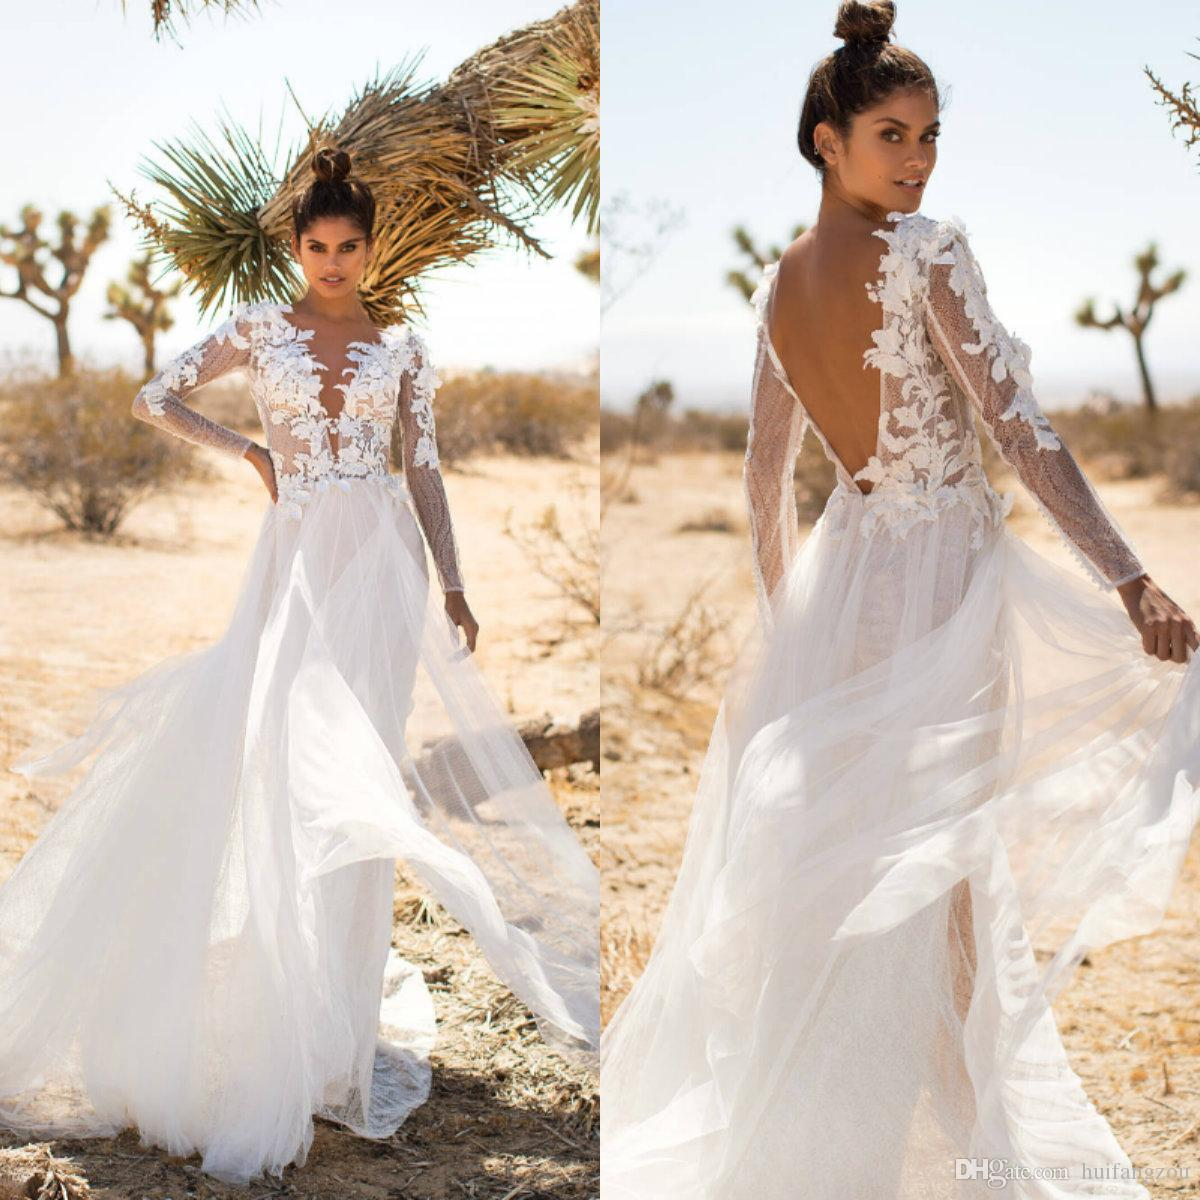 b9317c5bda7 Milla Nova 2019 Wedding Dresses V Neck Lace Long Sleeve Appliques Tulle  Sweep Train Bridal Gowns Backless Beach Wedding Dress Cheap Wedding Dresses  Wedding ...